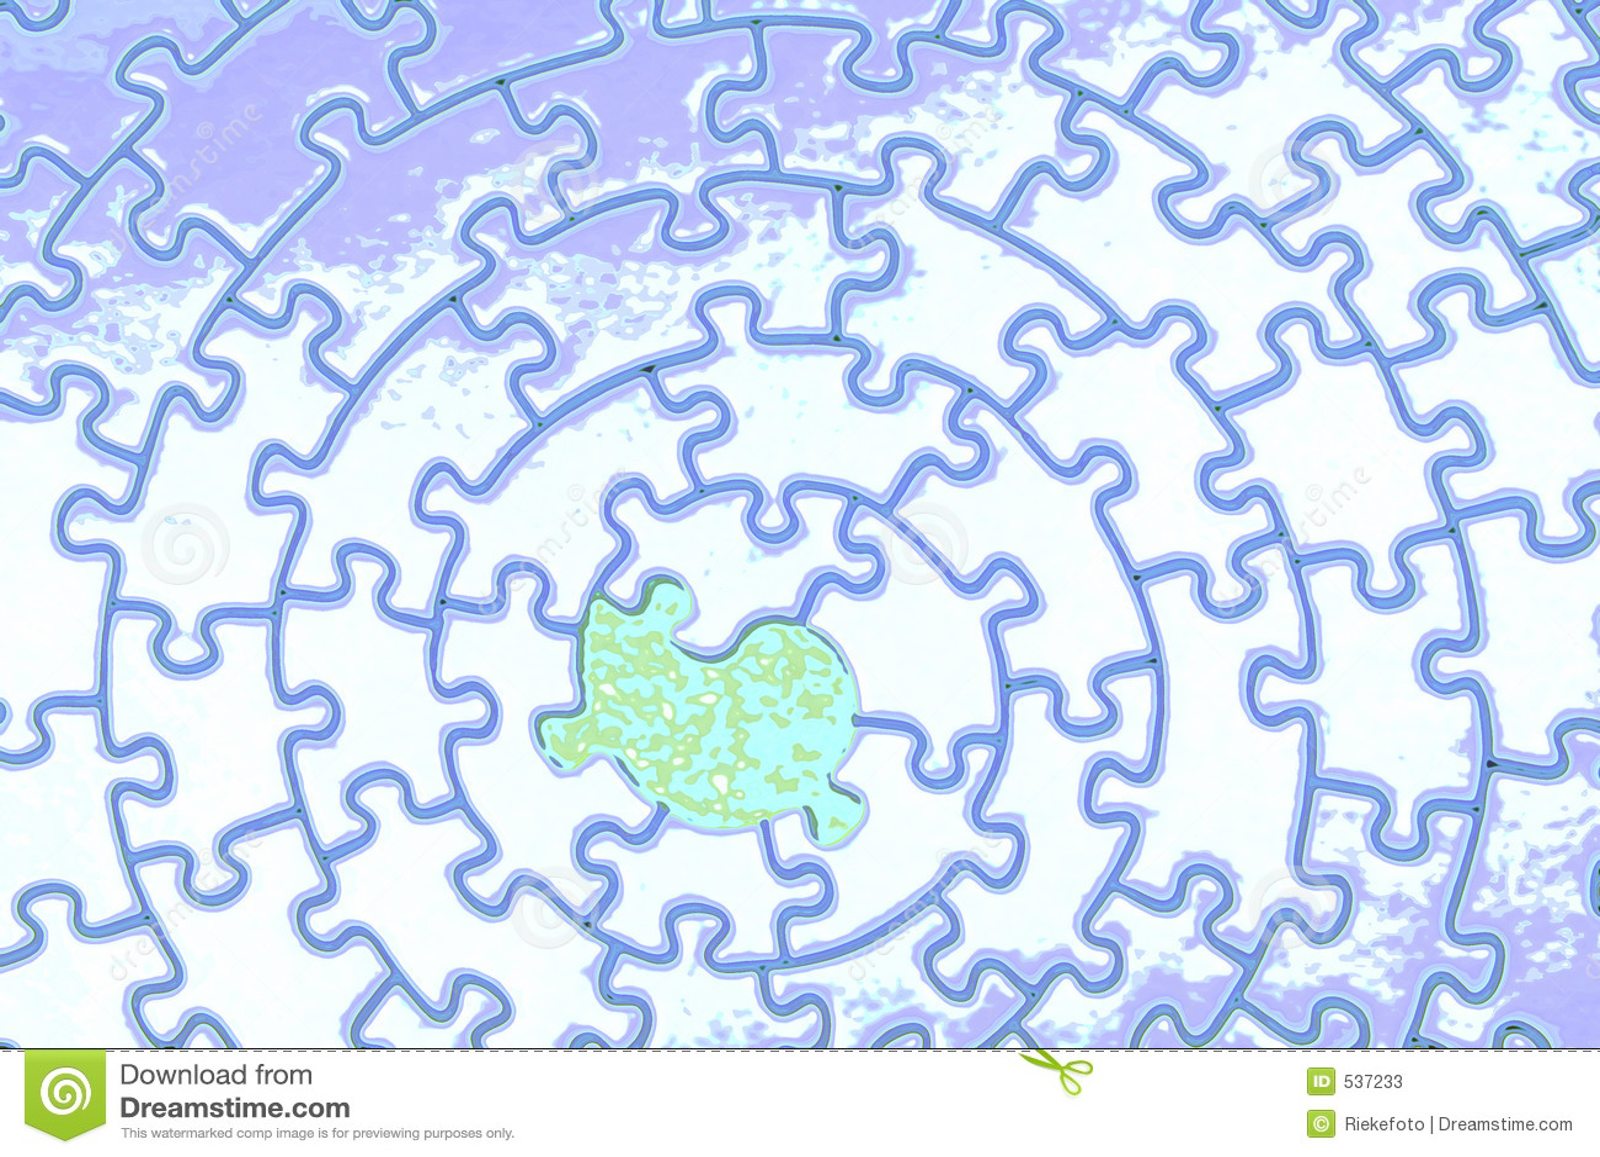 Download 抽象蓝色曲线锯的缺少一件白色 库存例证. 插画 包括有 圈子, 竞争, 适应, 夹具, 隐喻, 被装配的, 挑战 - 537233